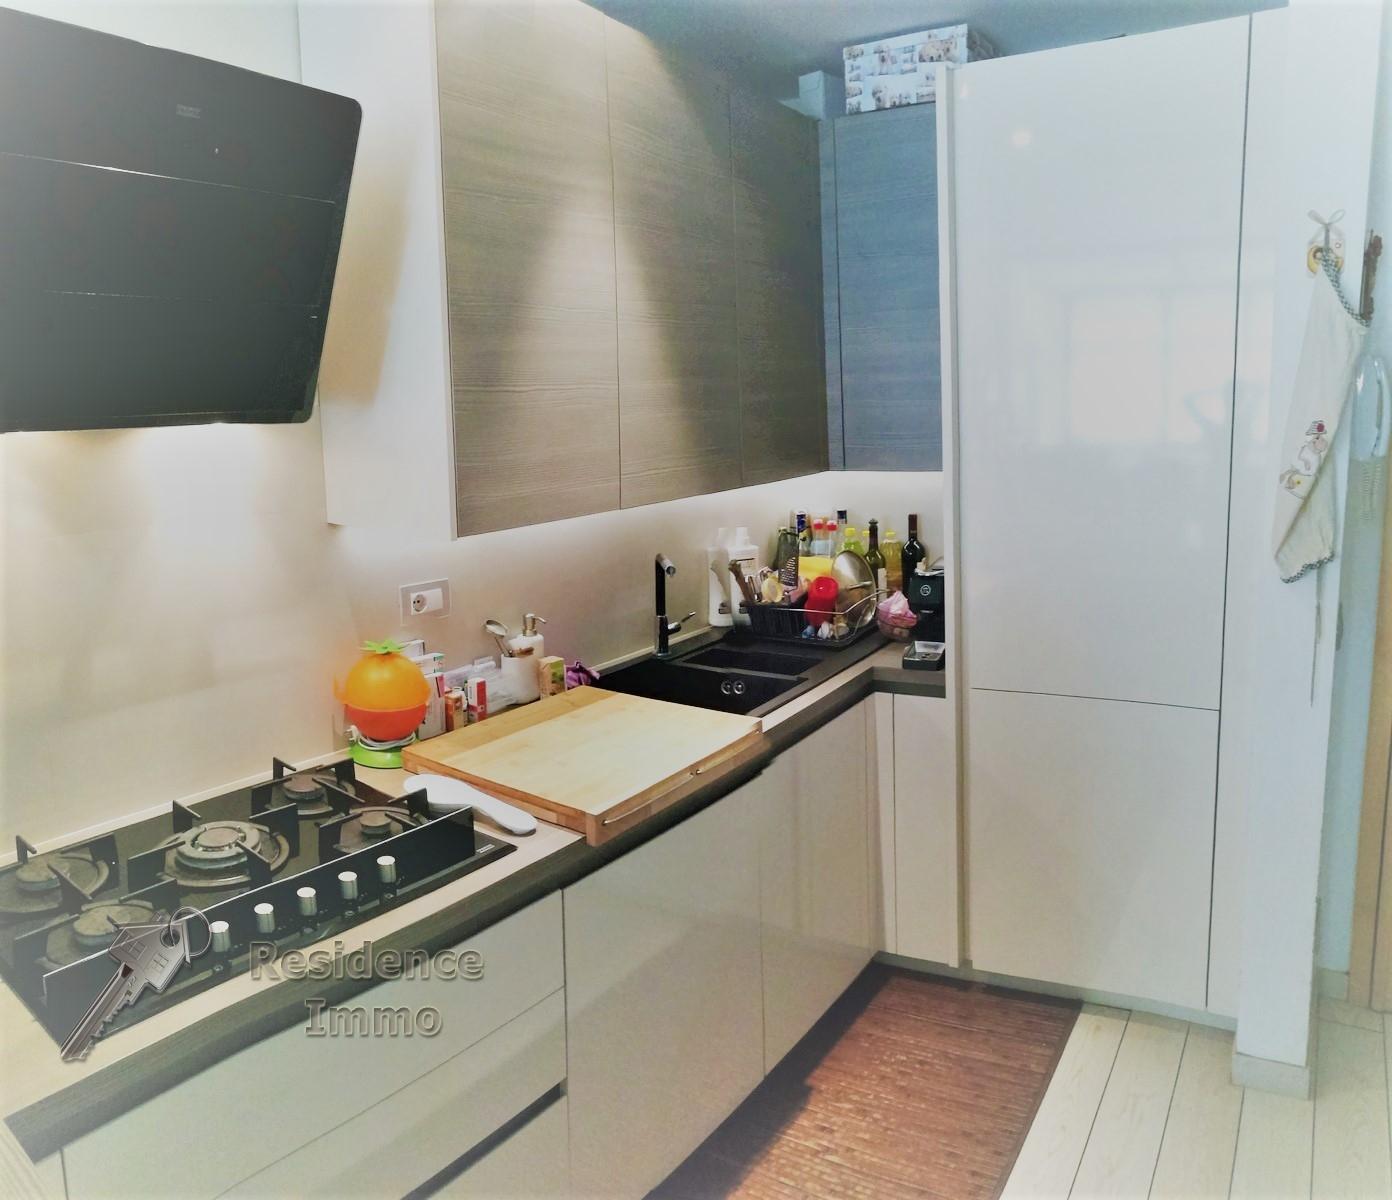 wohnung kaufen in bolzano bozen kodex 2094. Black Bedroom Furniture Sets. Home Design Ideas